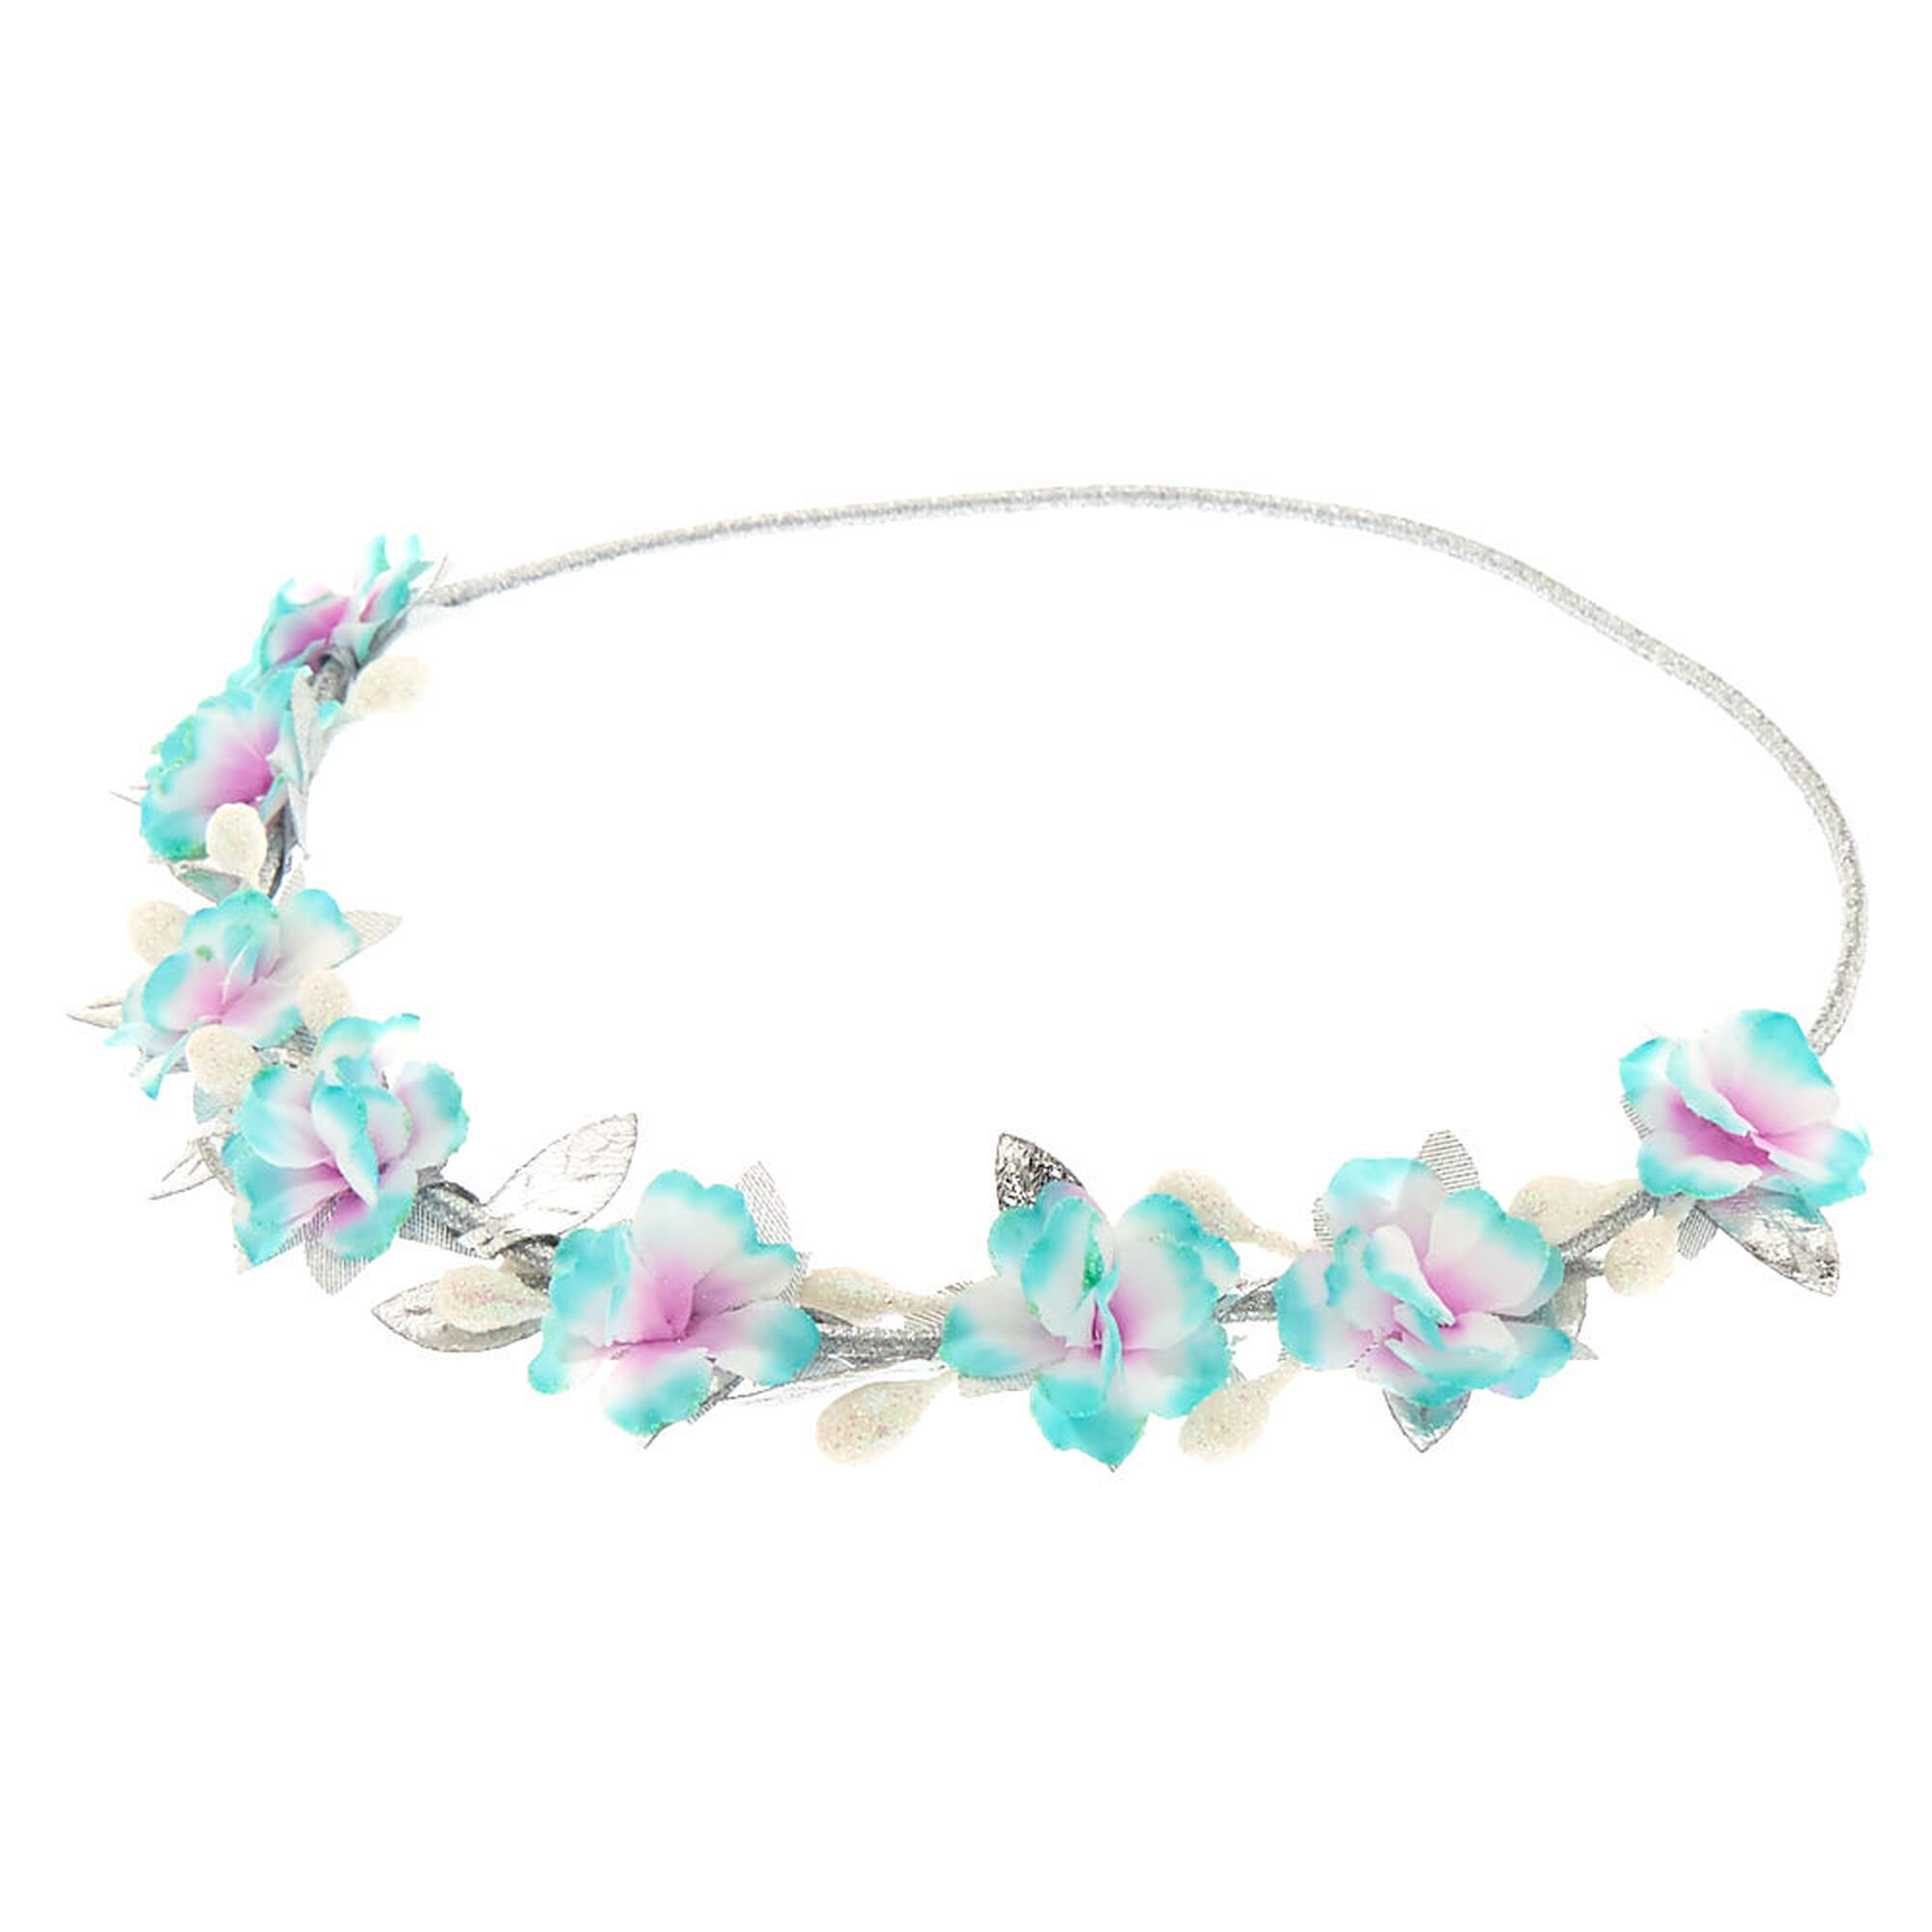 Mint silver flower crown headwrap claires us mint amp silver flower crown headwrap izmirmasajfo